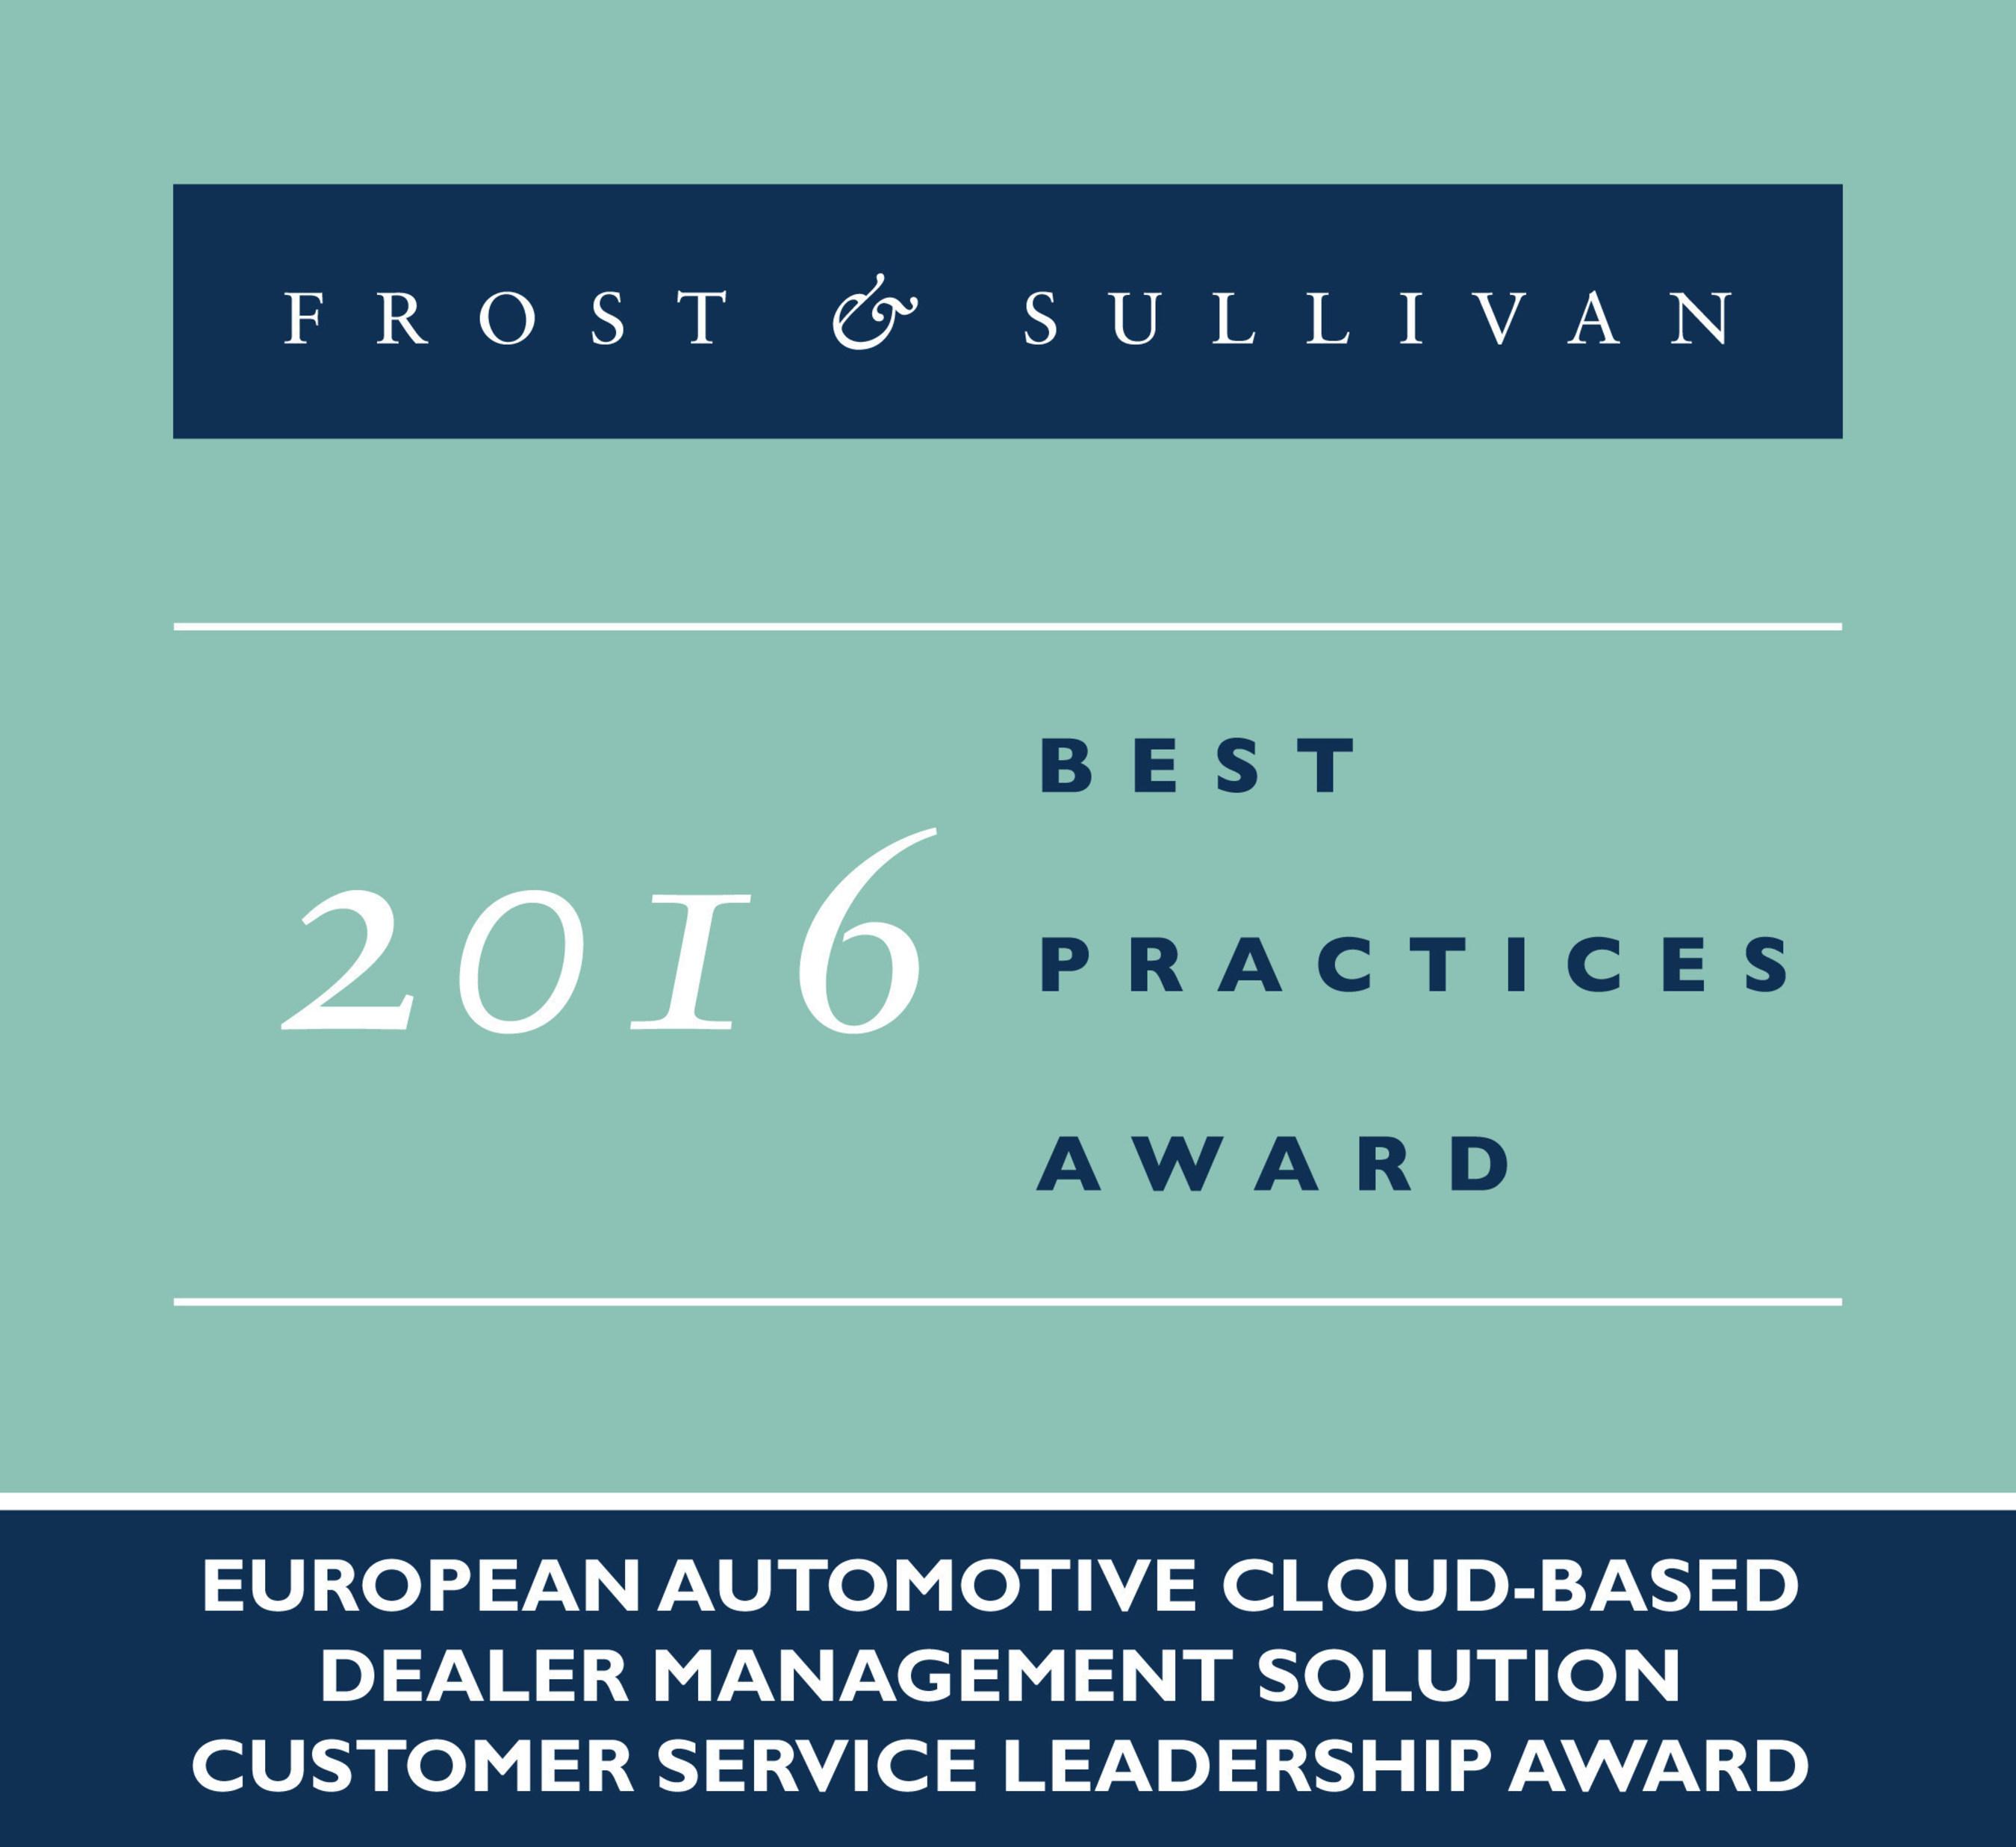 2016 European Automotive Cloud - based Dealer Management Solution Customer Service Leadership Award